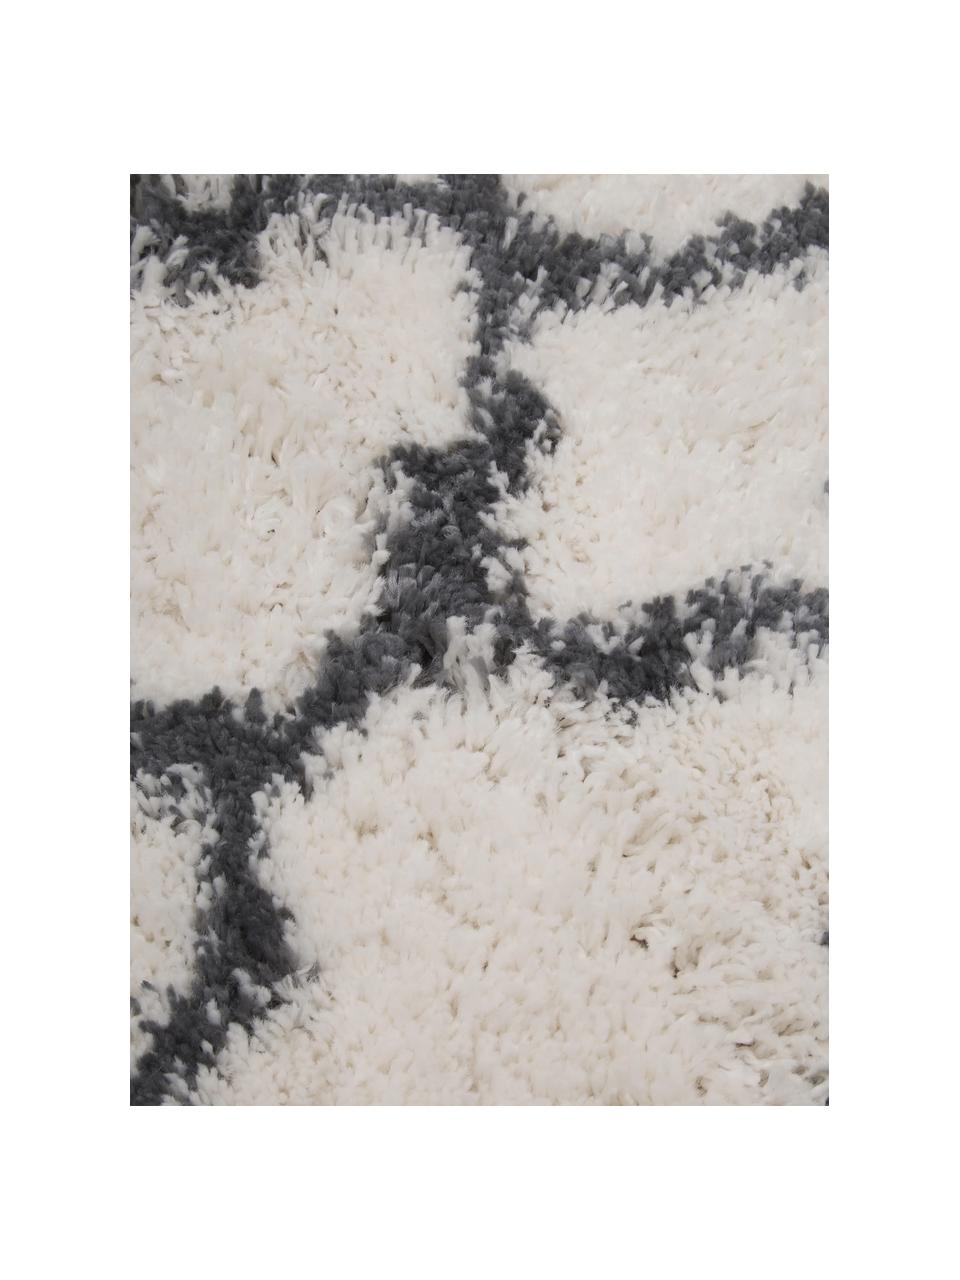 Hochflor-Läufer Mona in Creme/Dunkelgrau, Flor: 100% Polypropylen, Cremeweiß, Dunkelgrau, 80 x 250 cm